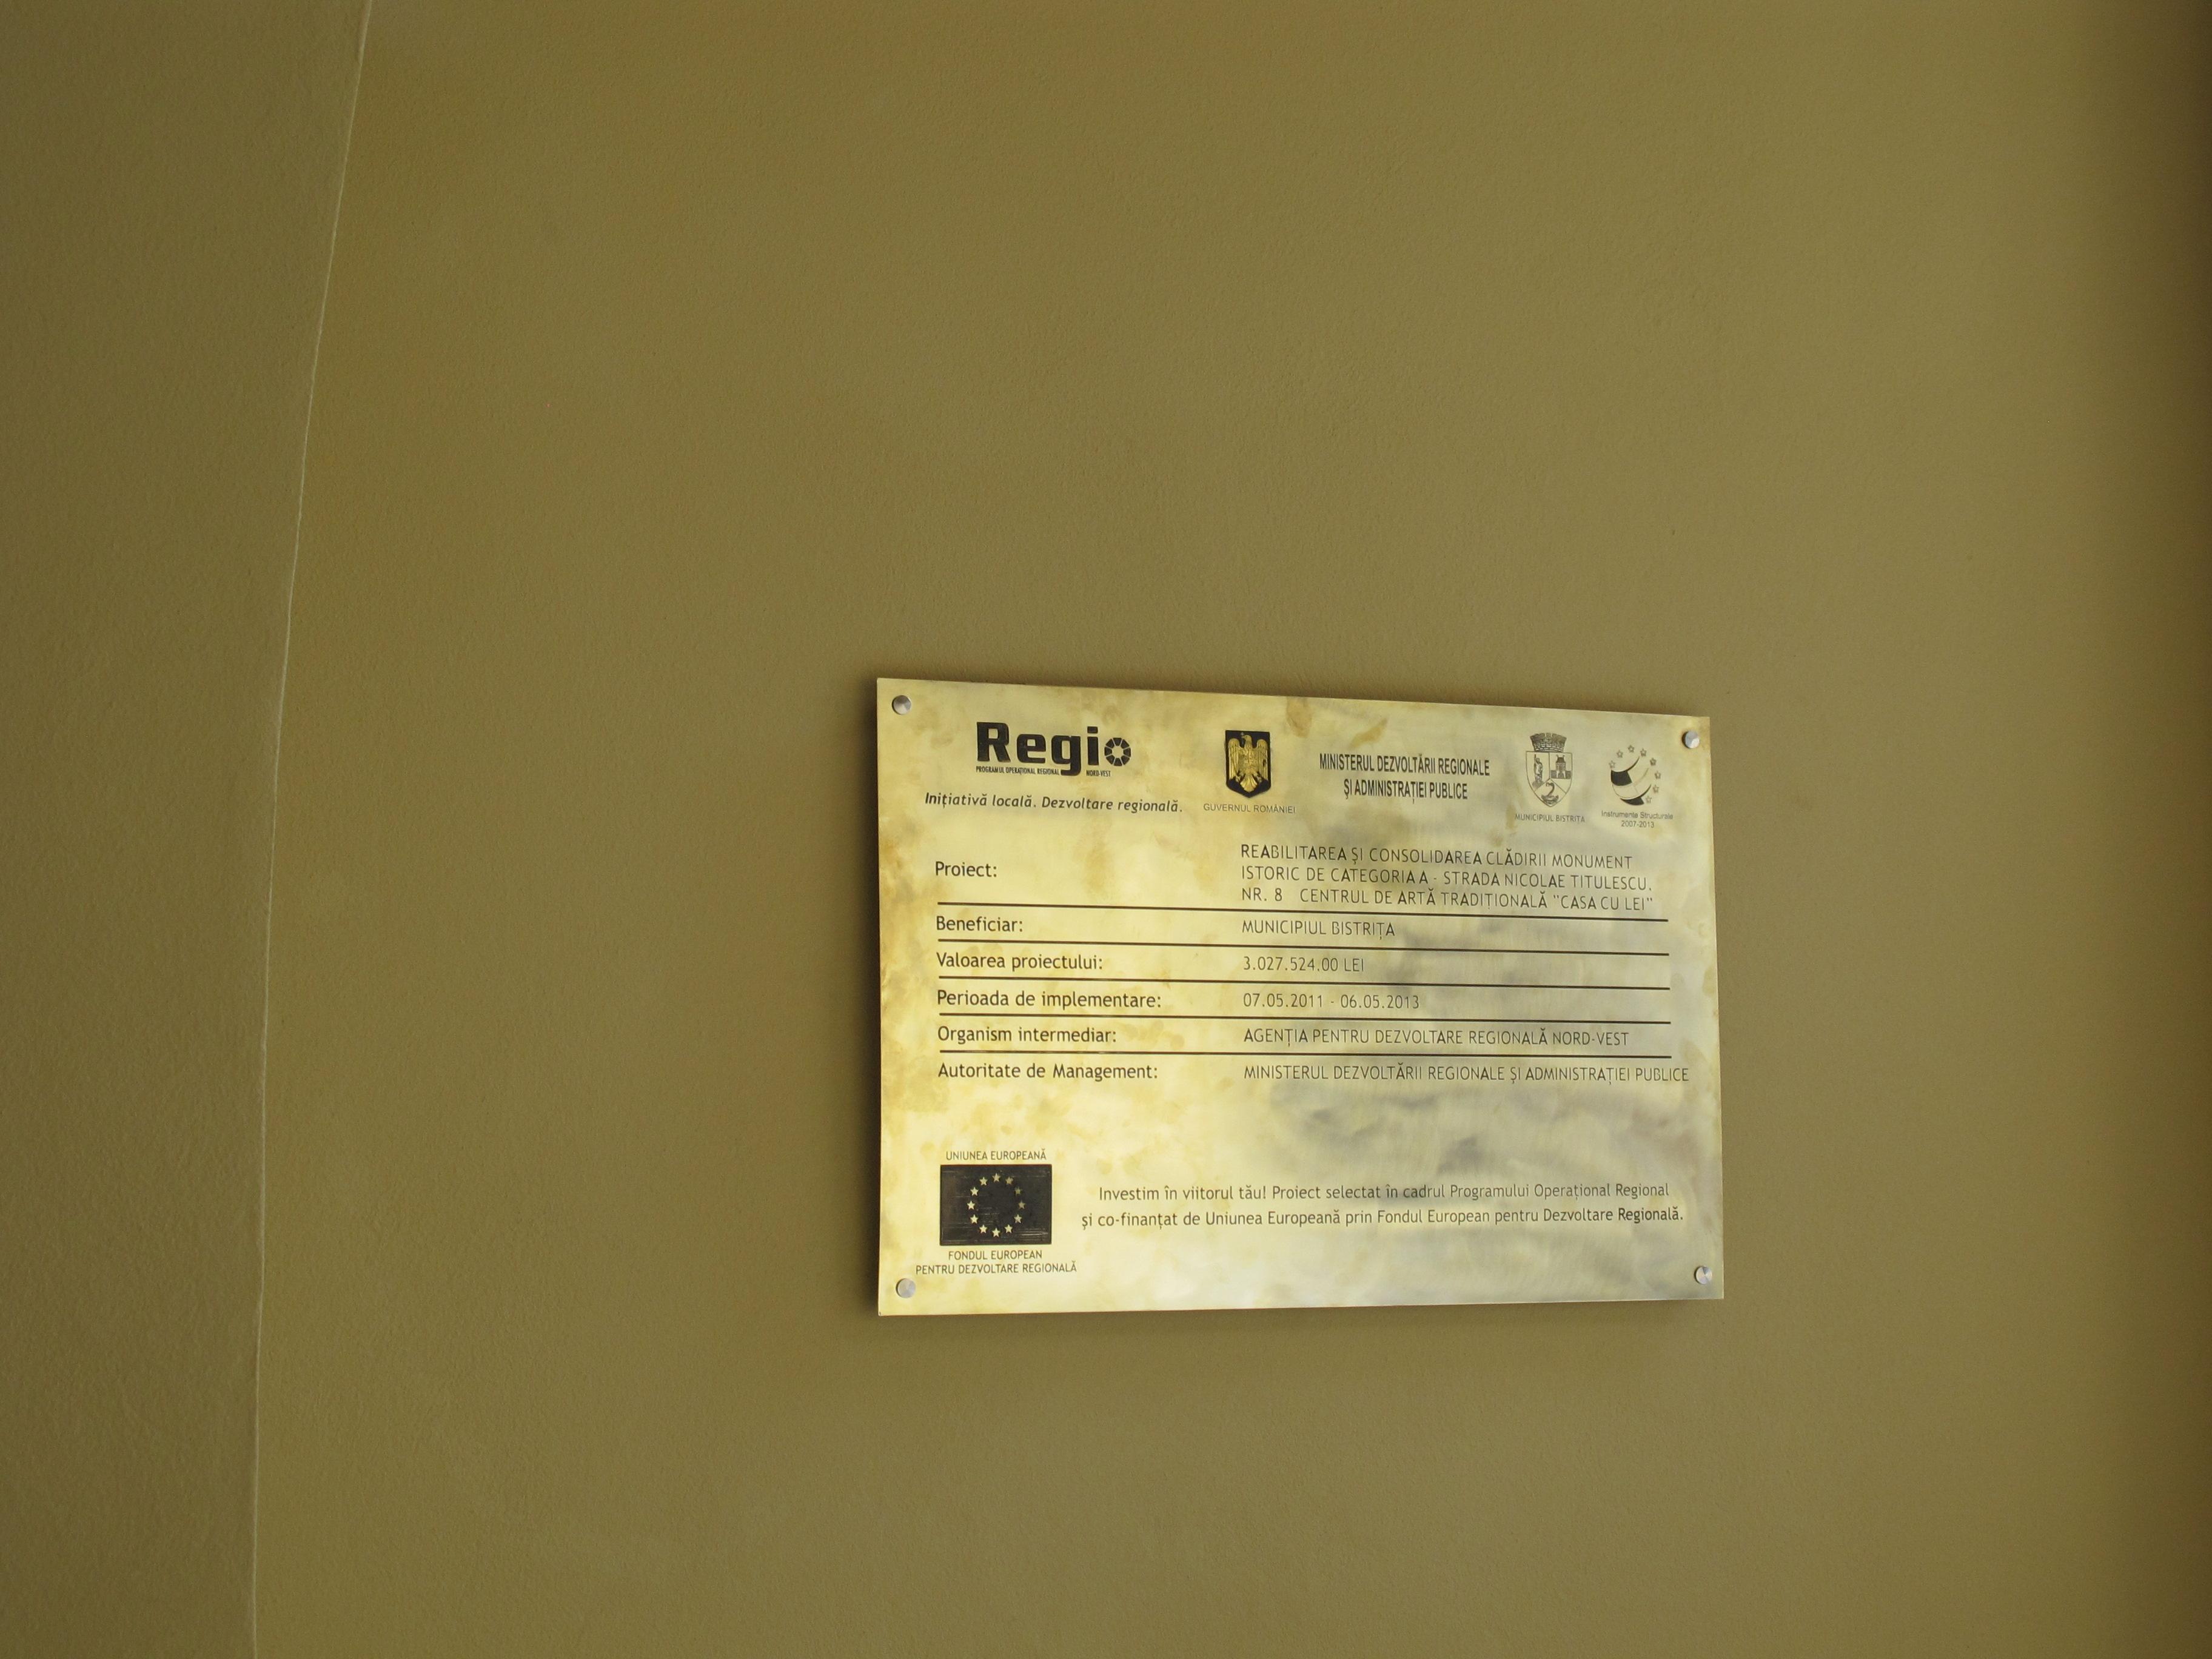 gravare alama placa 70x45cm fonduri europene, regio